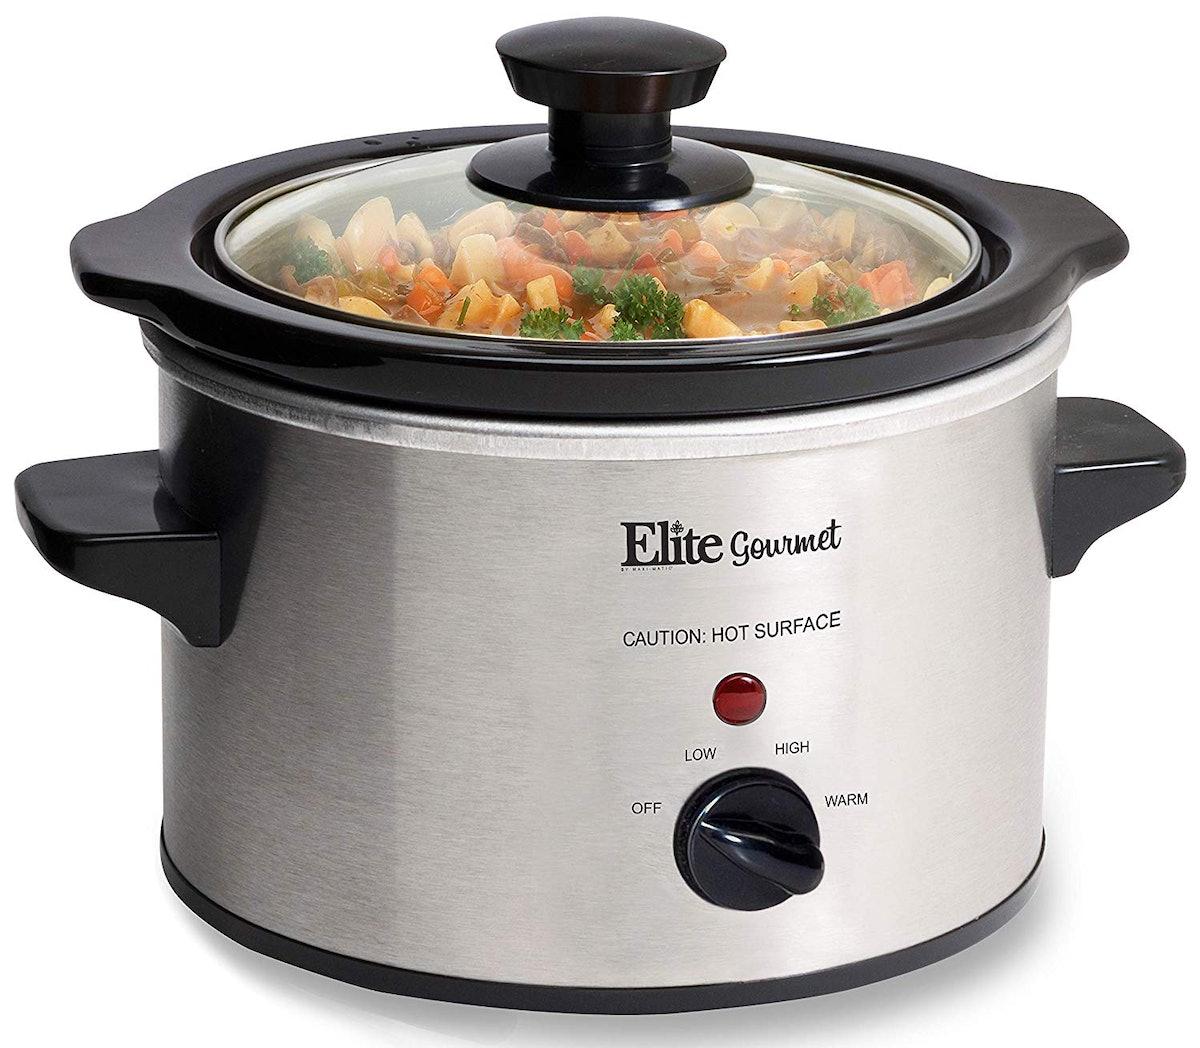 Elite Gourmet MST-250XS Electric Slow Cooker